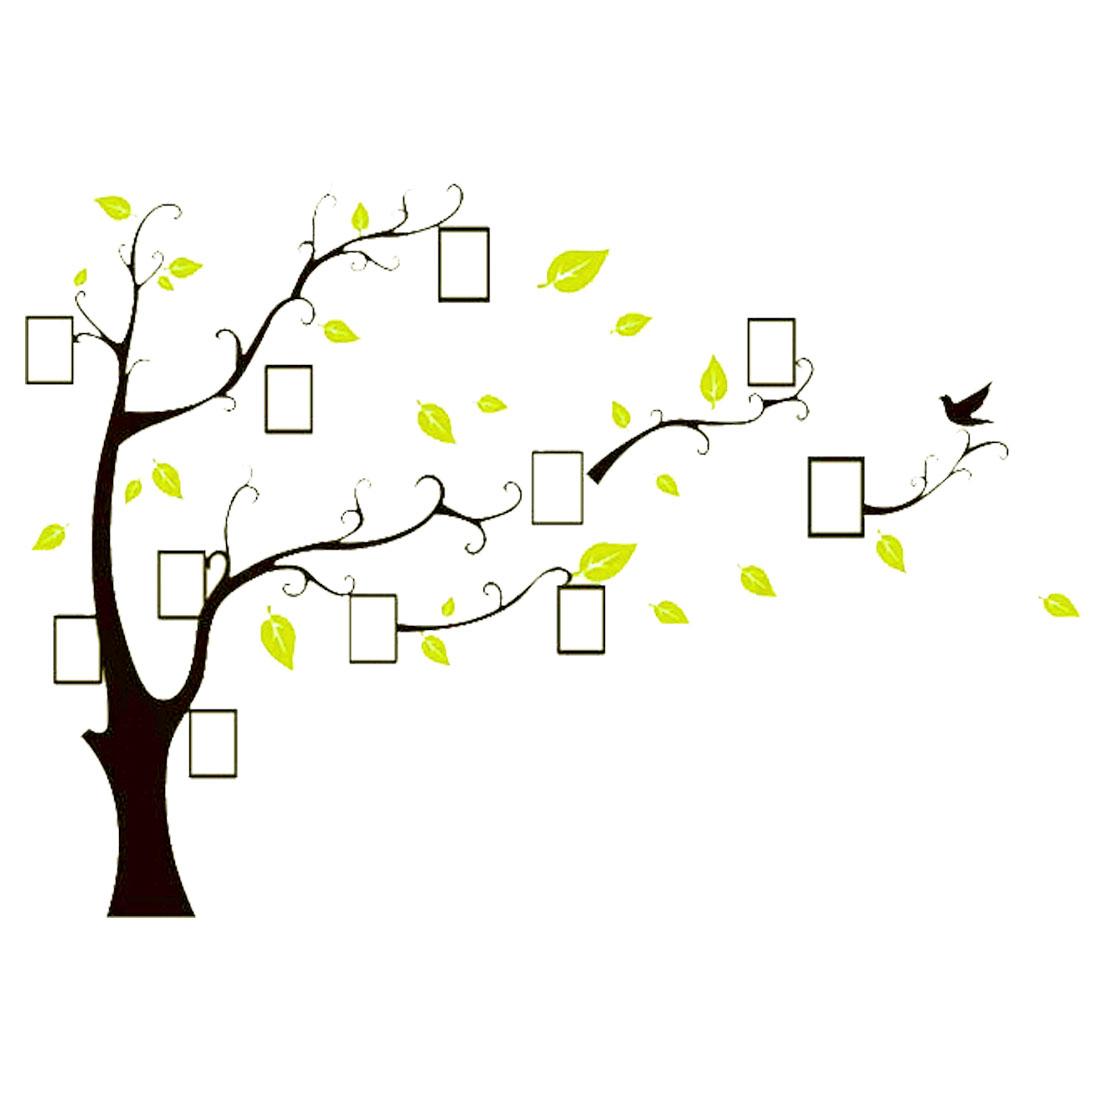 Room Acrylic Tree Photo Frame Design DIY Self-adhesive 3D Wall Sticker Yellow